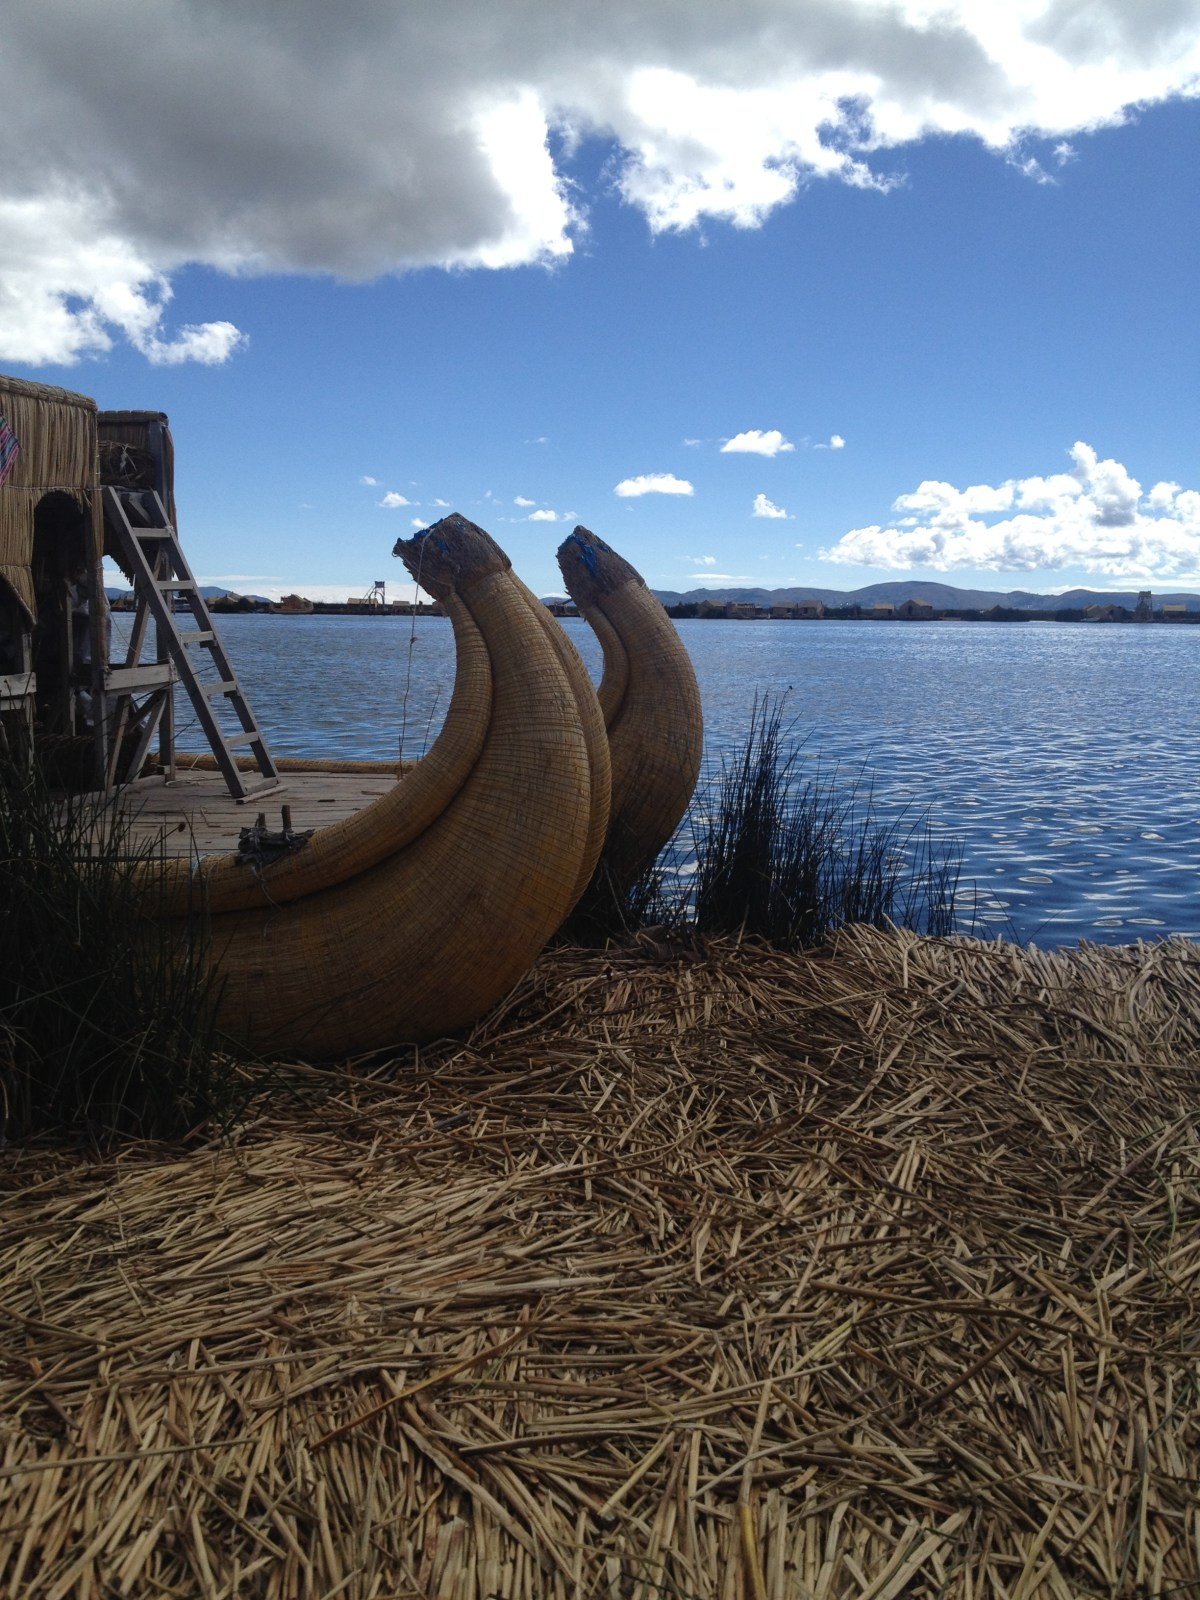 Lake Titicaca: Photo Gallery